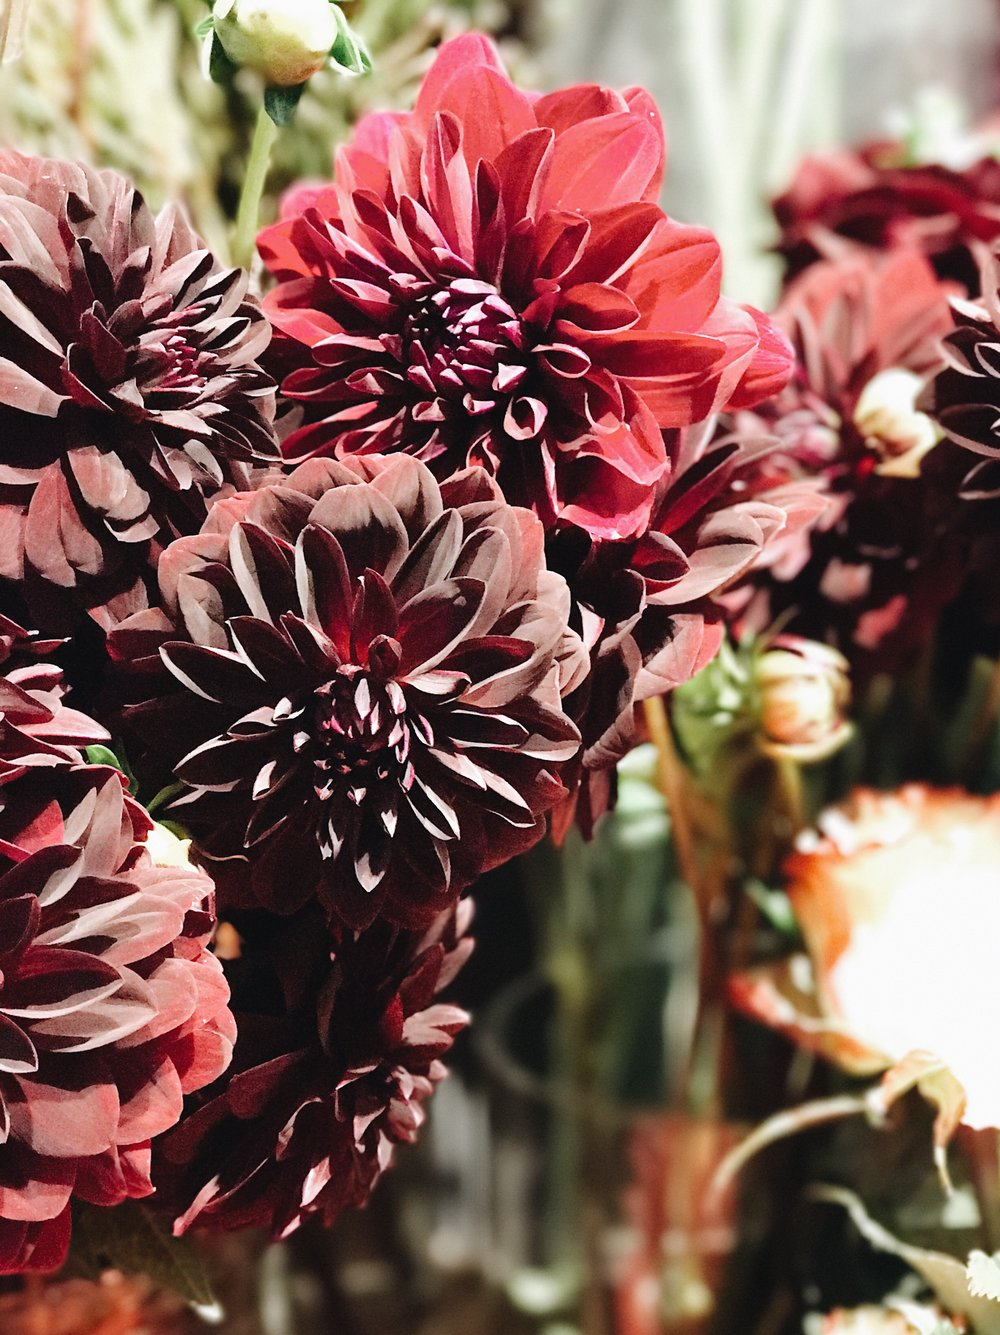 Fall Flowers 101, Dahlias, Nyla Free Designs Inc.